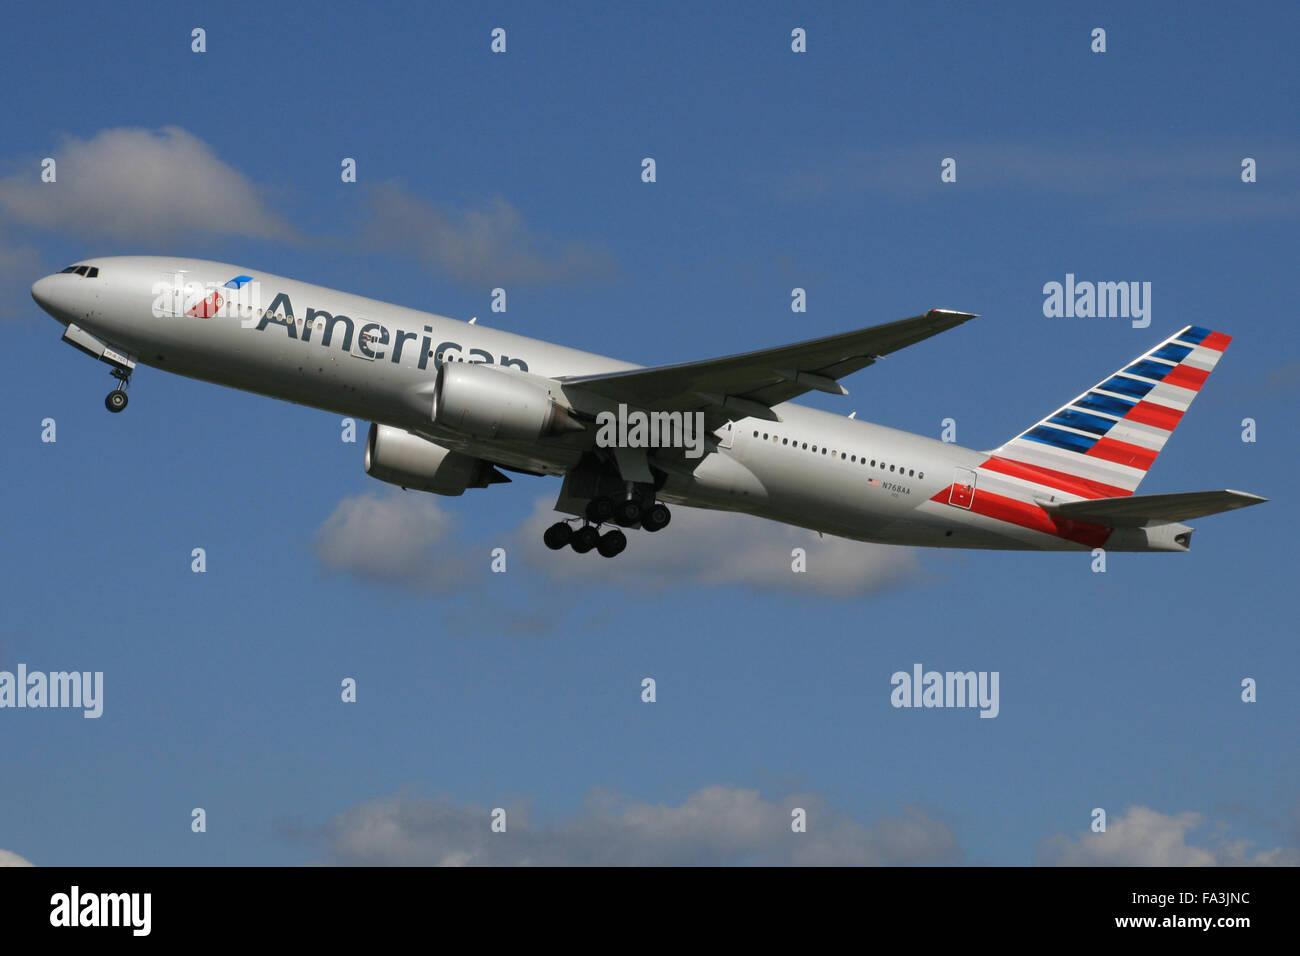 Boeing B777-200 American Airlines